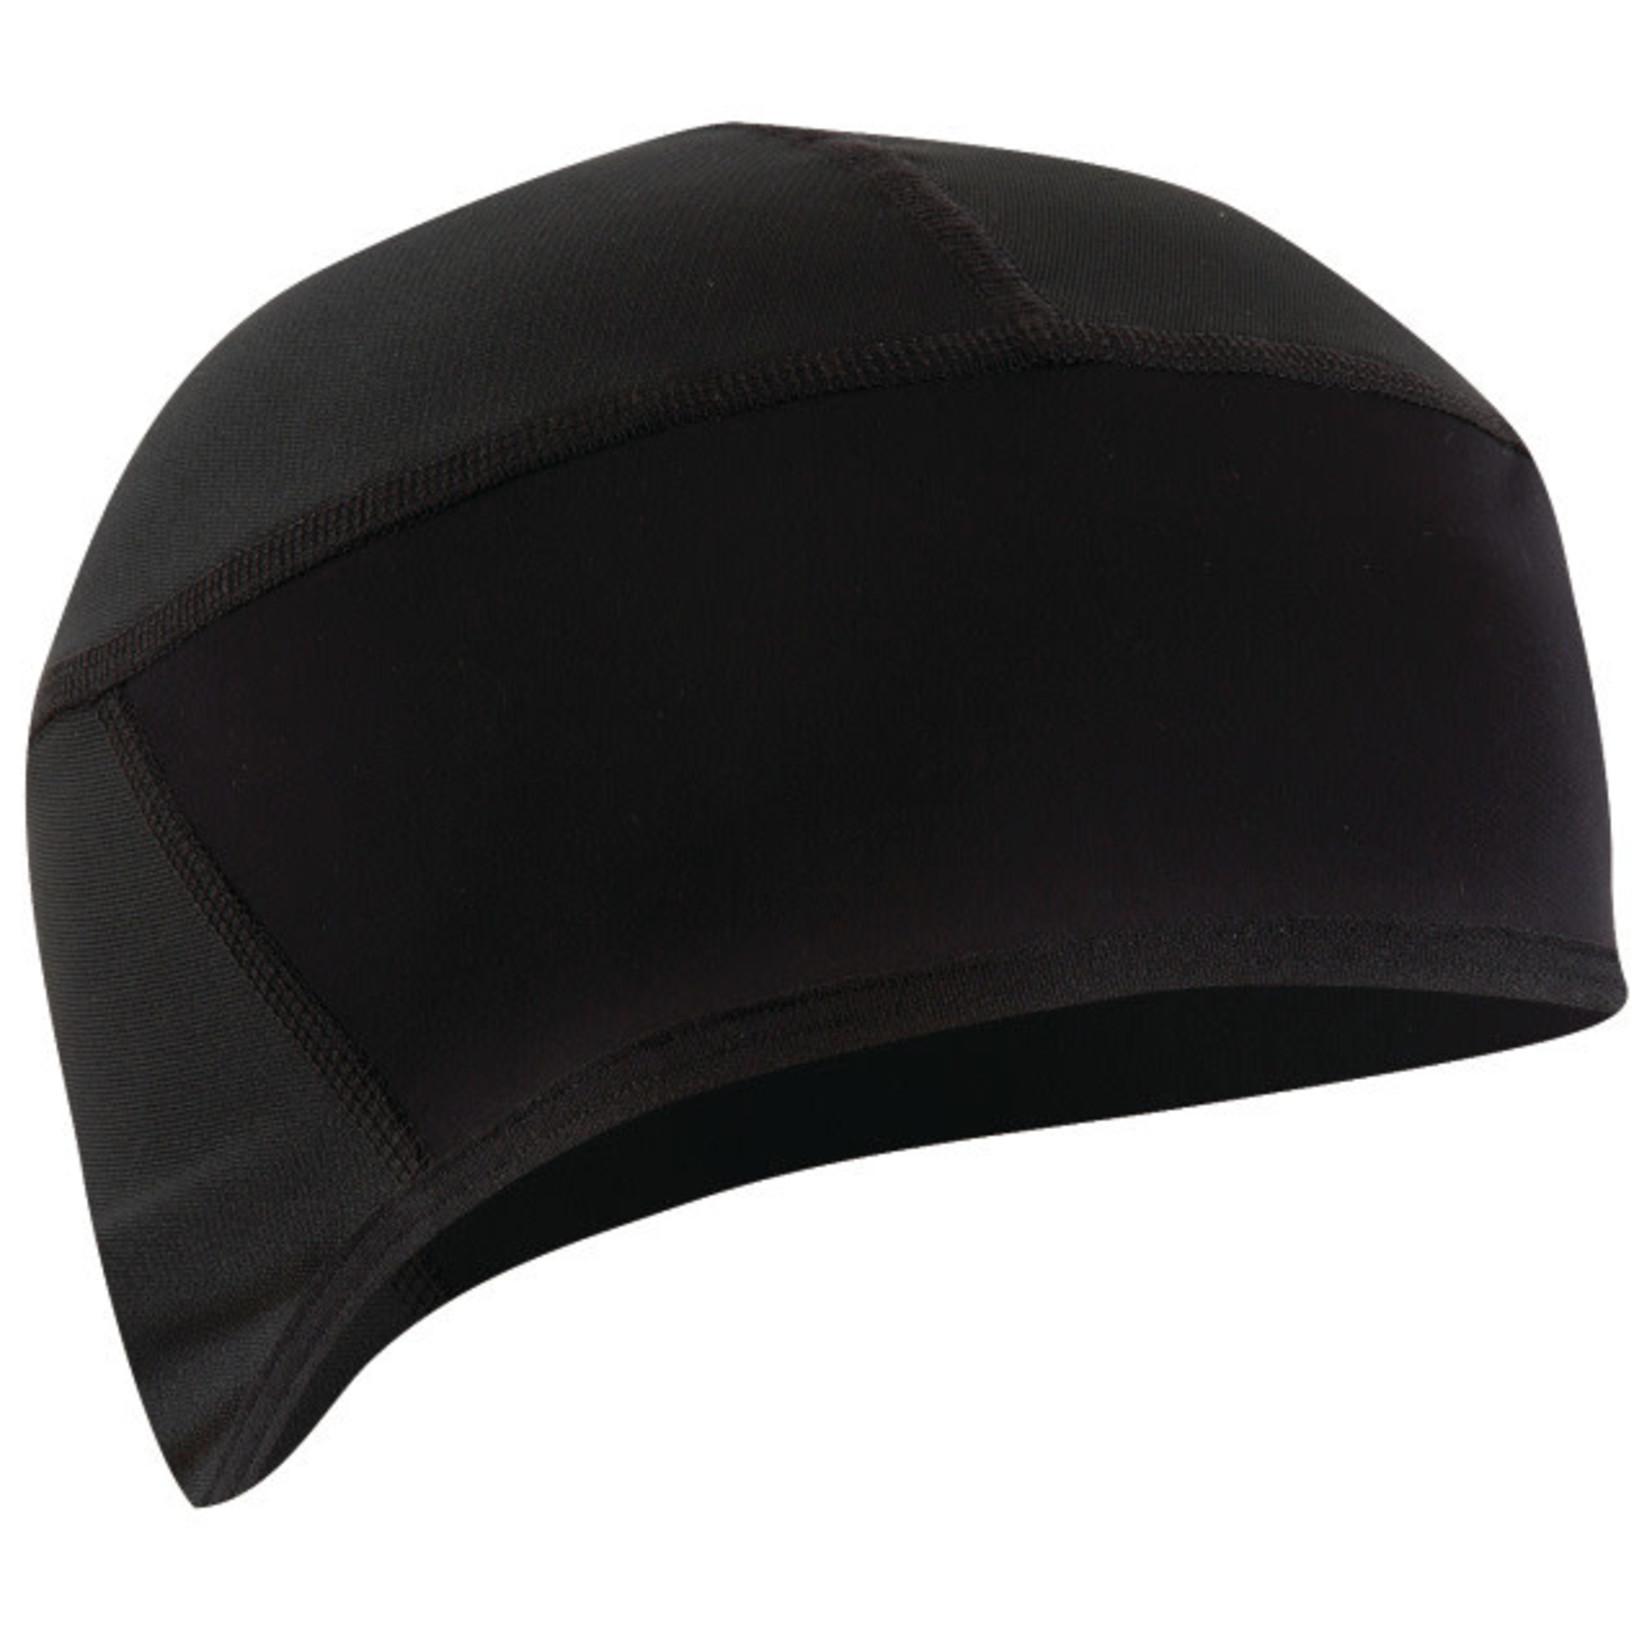 PEARL iZUMi - Barrier Skullcap black